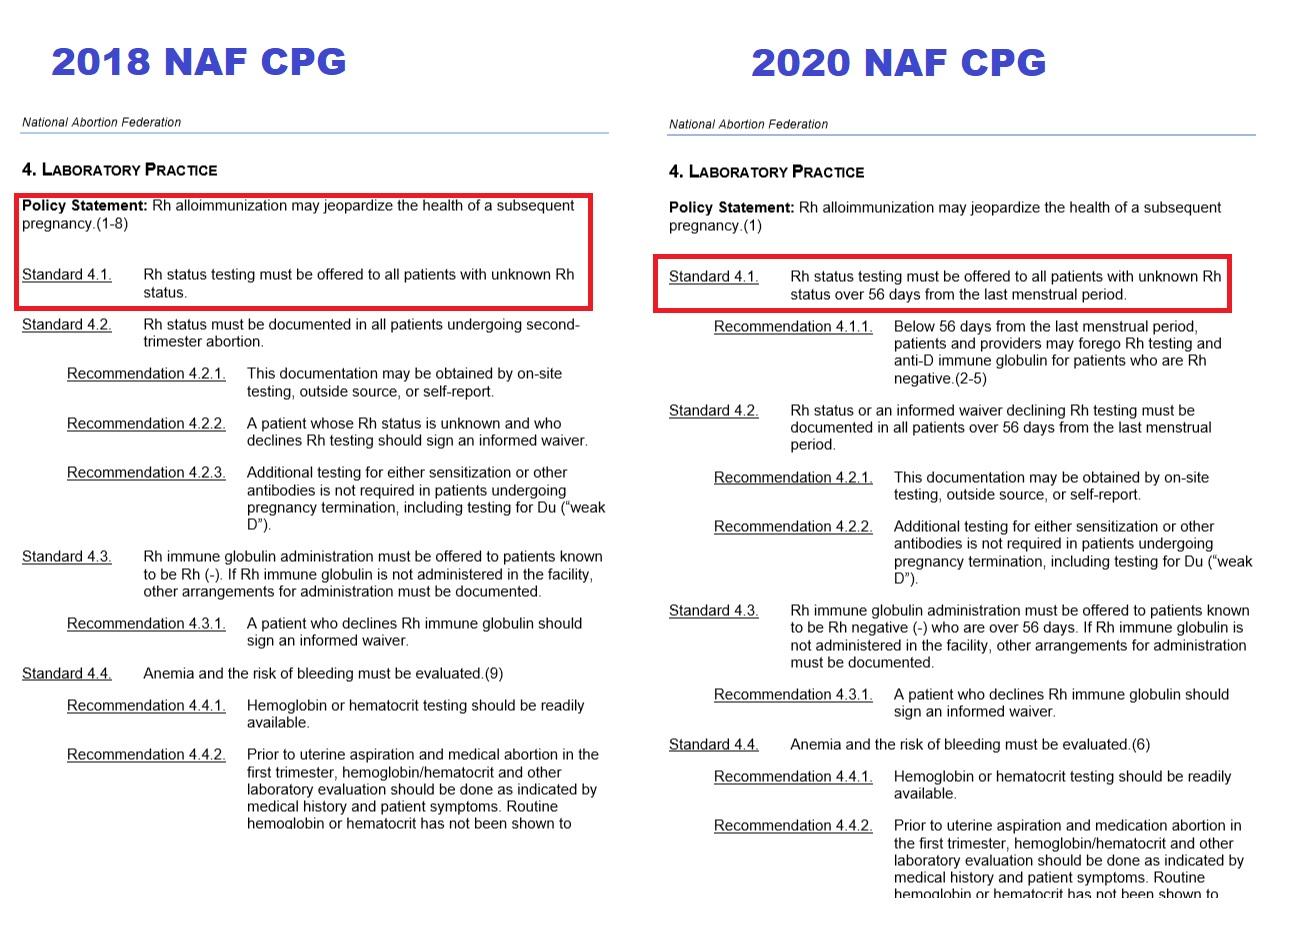 Image: NAF RH Testing on abortion patients 2018 v 2020 CPG